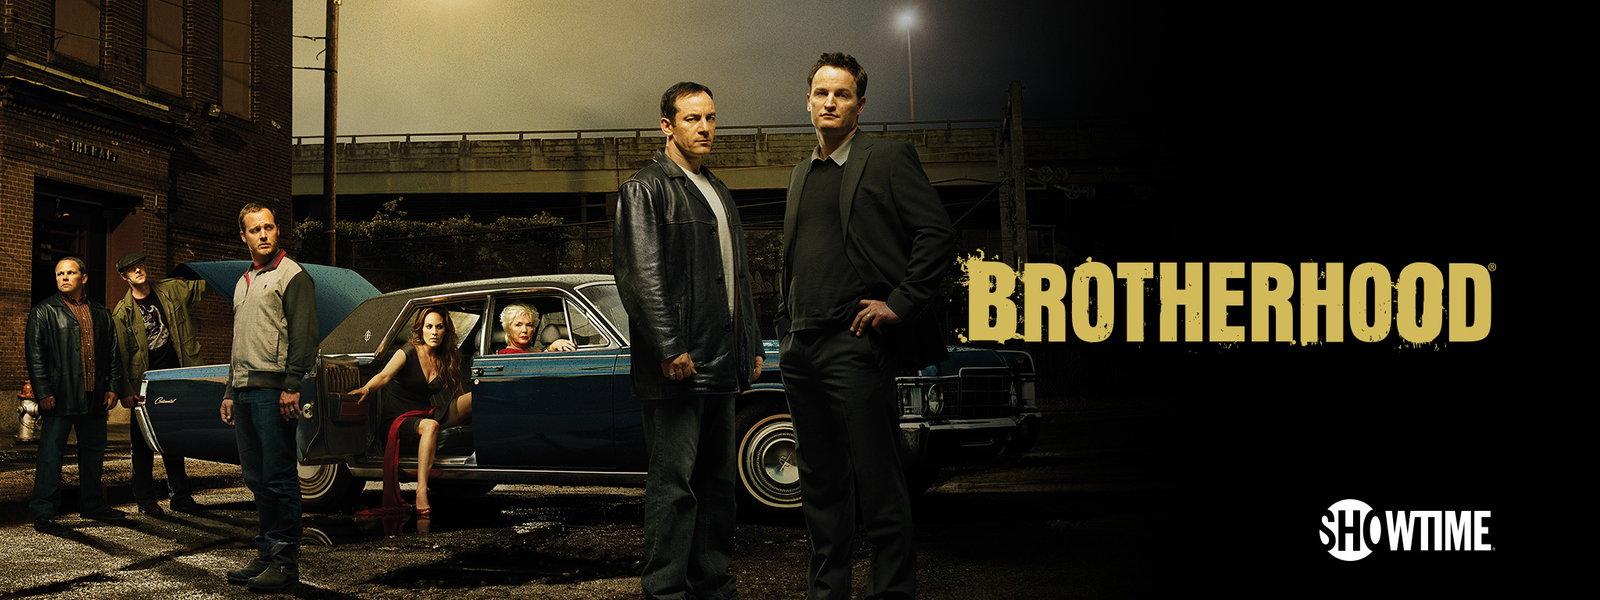 Brotherhood Showtime.jpeg